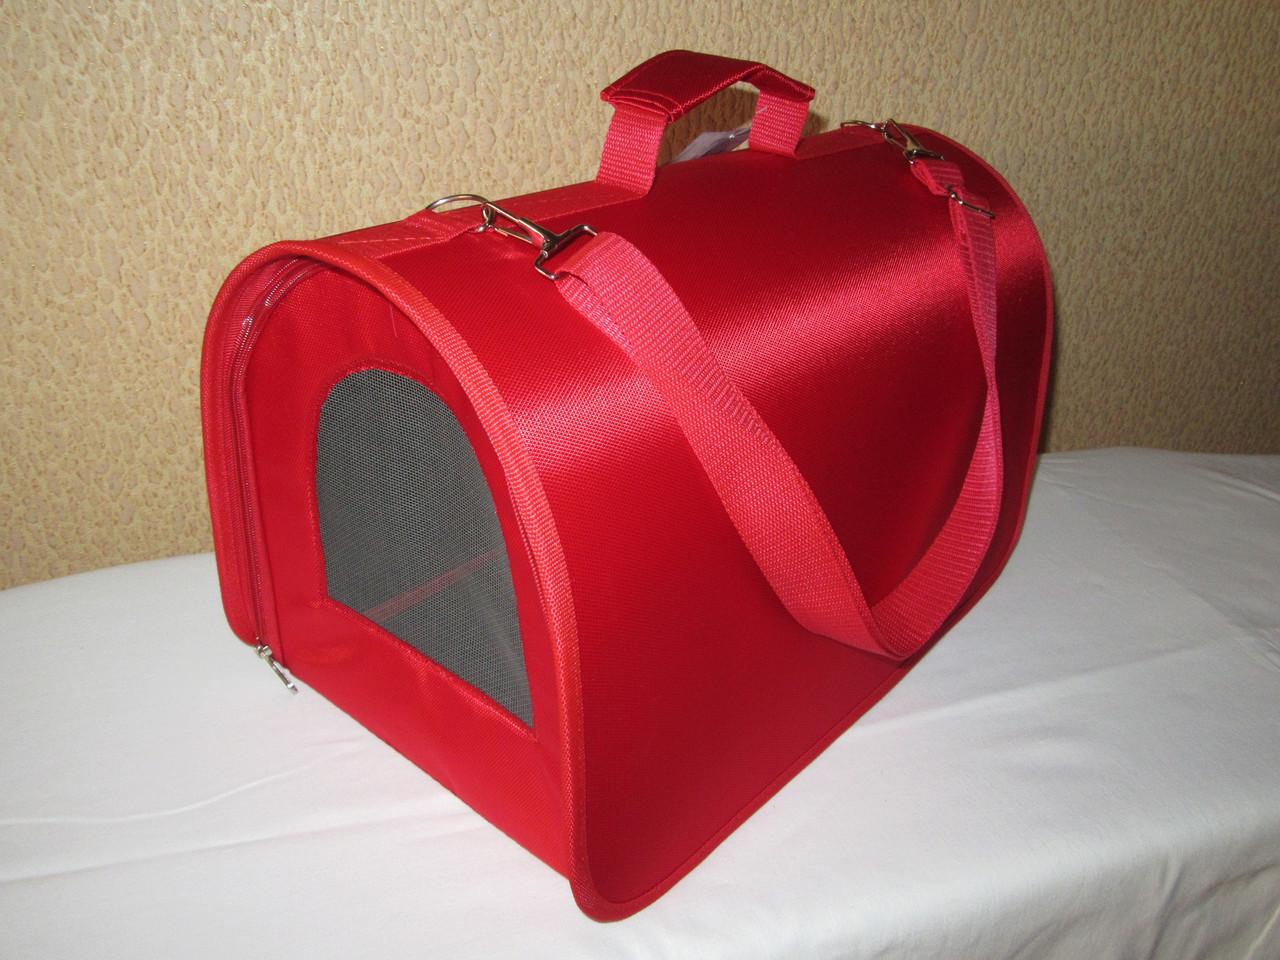 Сумка-переноска (тоннель) 34,5х22х21см, красная